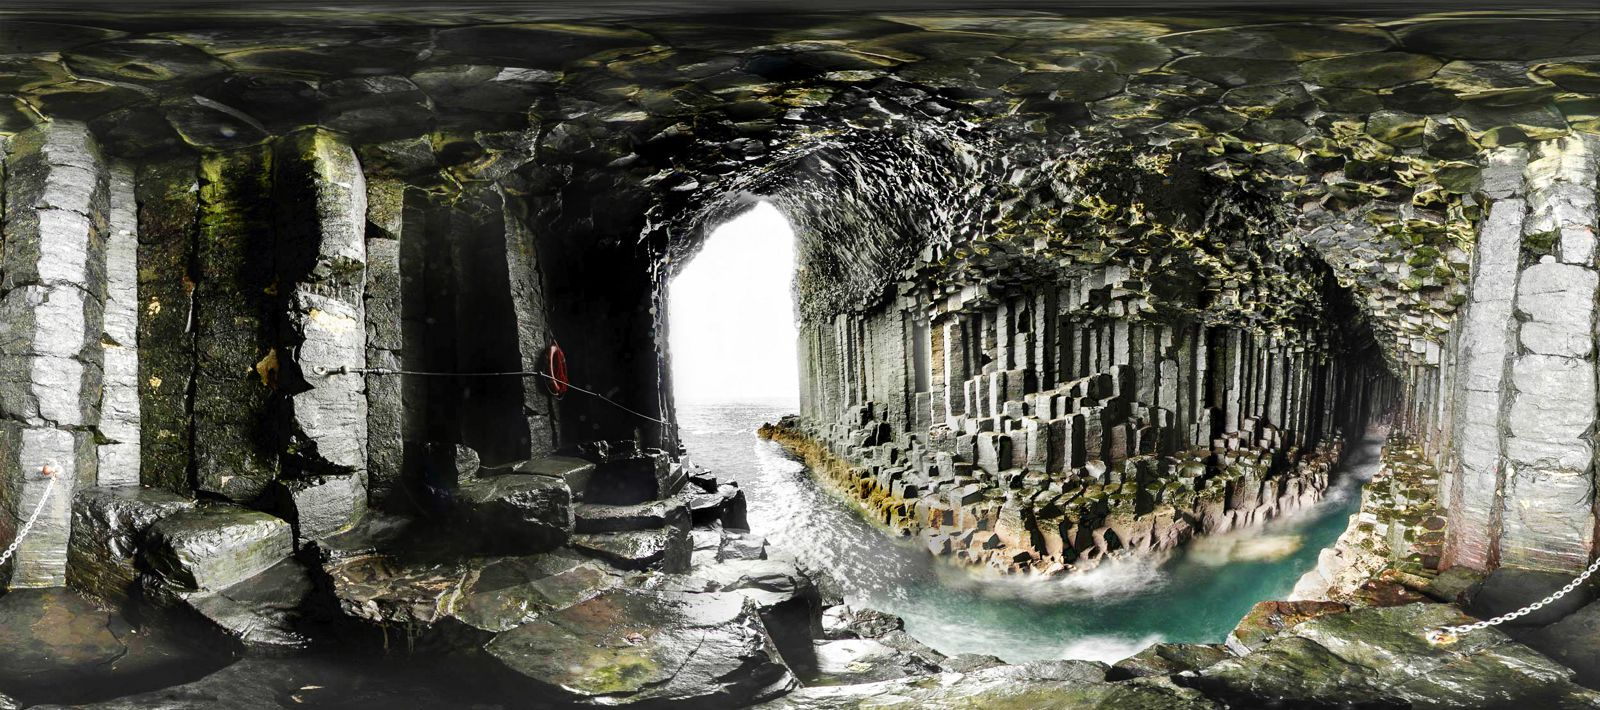 10 Secret Scottish Islands That Every Traveller Must Visit (9)